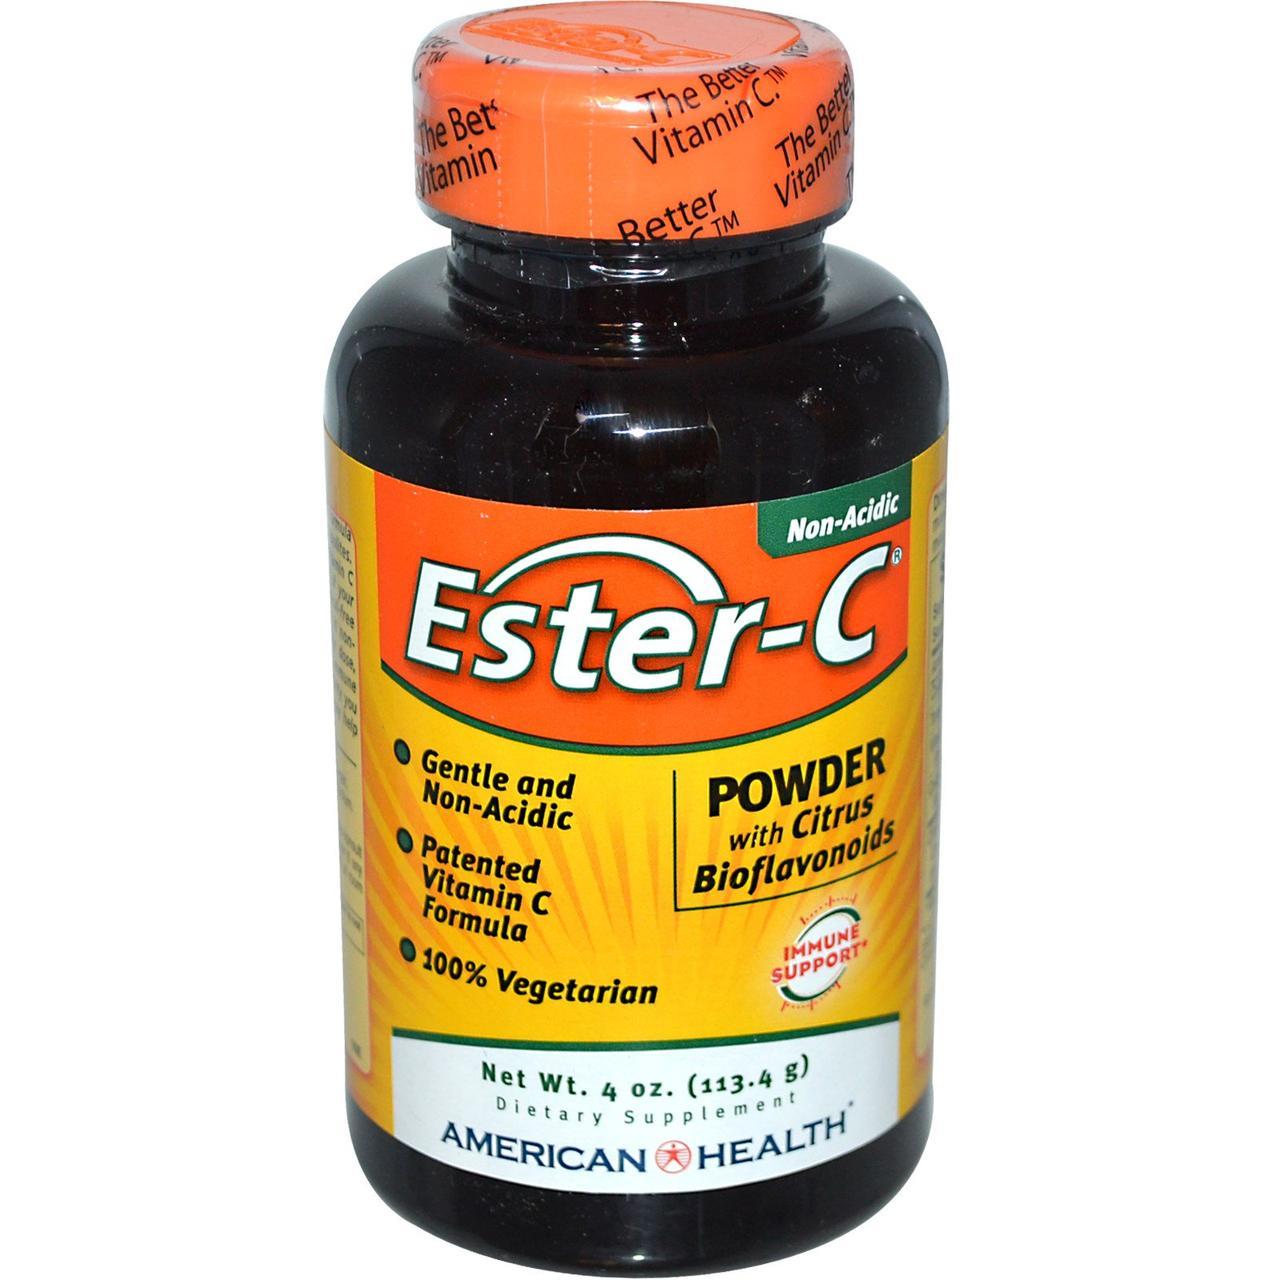 American Health, Эстер-С, порошок с цитрусовыми биофлавоноидами, 4 унции (113,4 г)